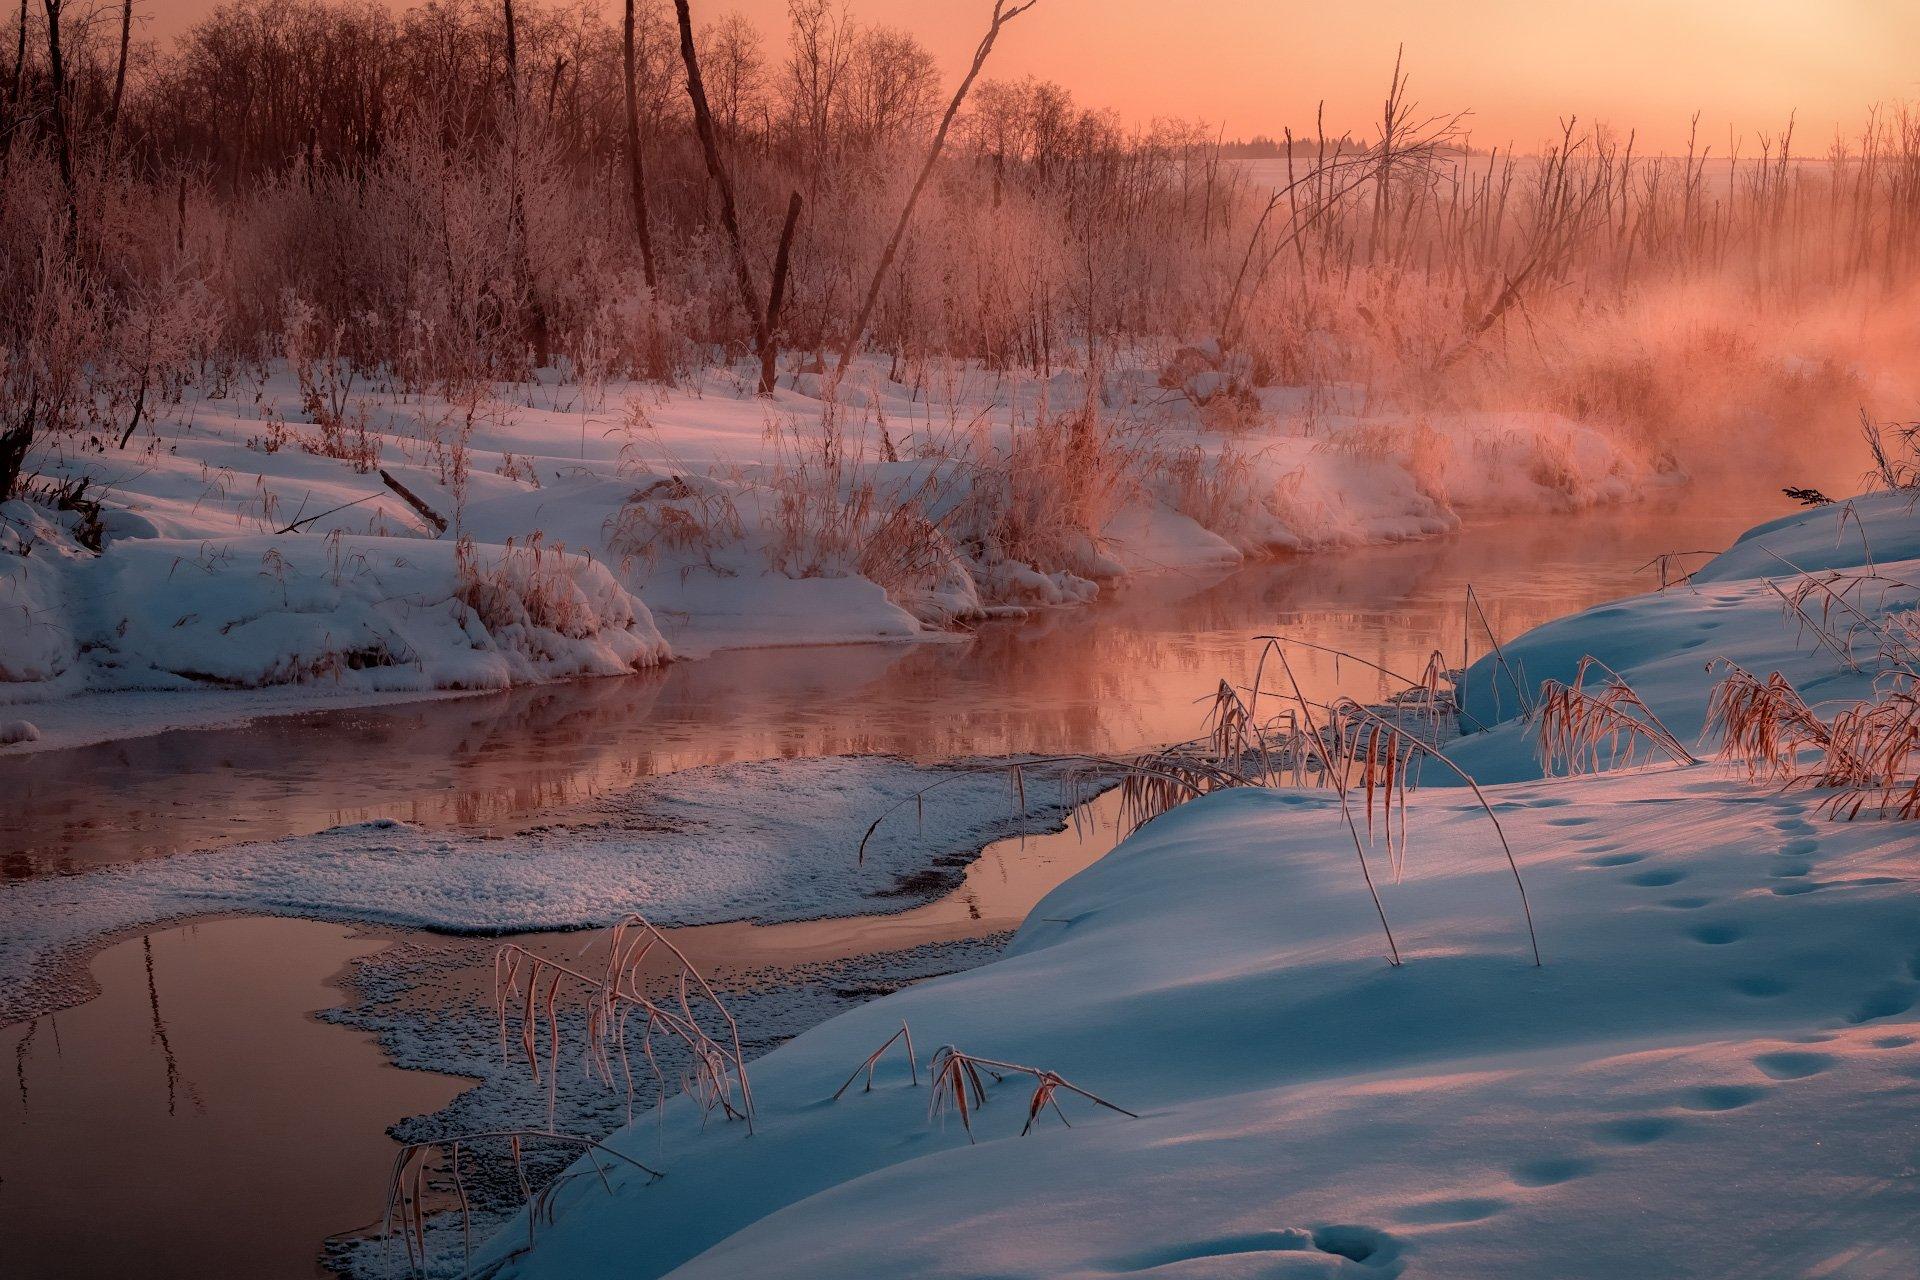 пейзаж, зима, река, лед, снег, утро, рассвет, восход, мороз, холод, россошка, пермь, пермский край, Андрей Чиж